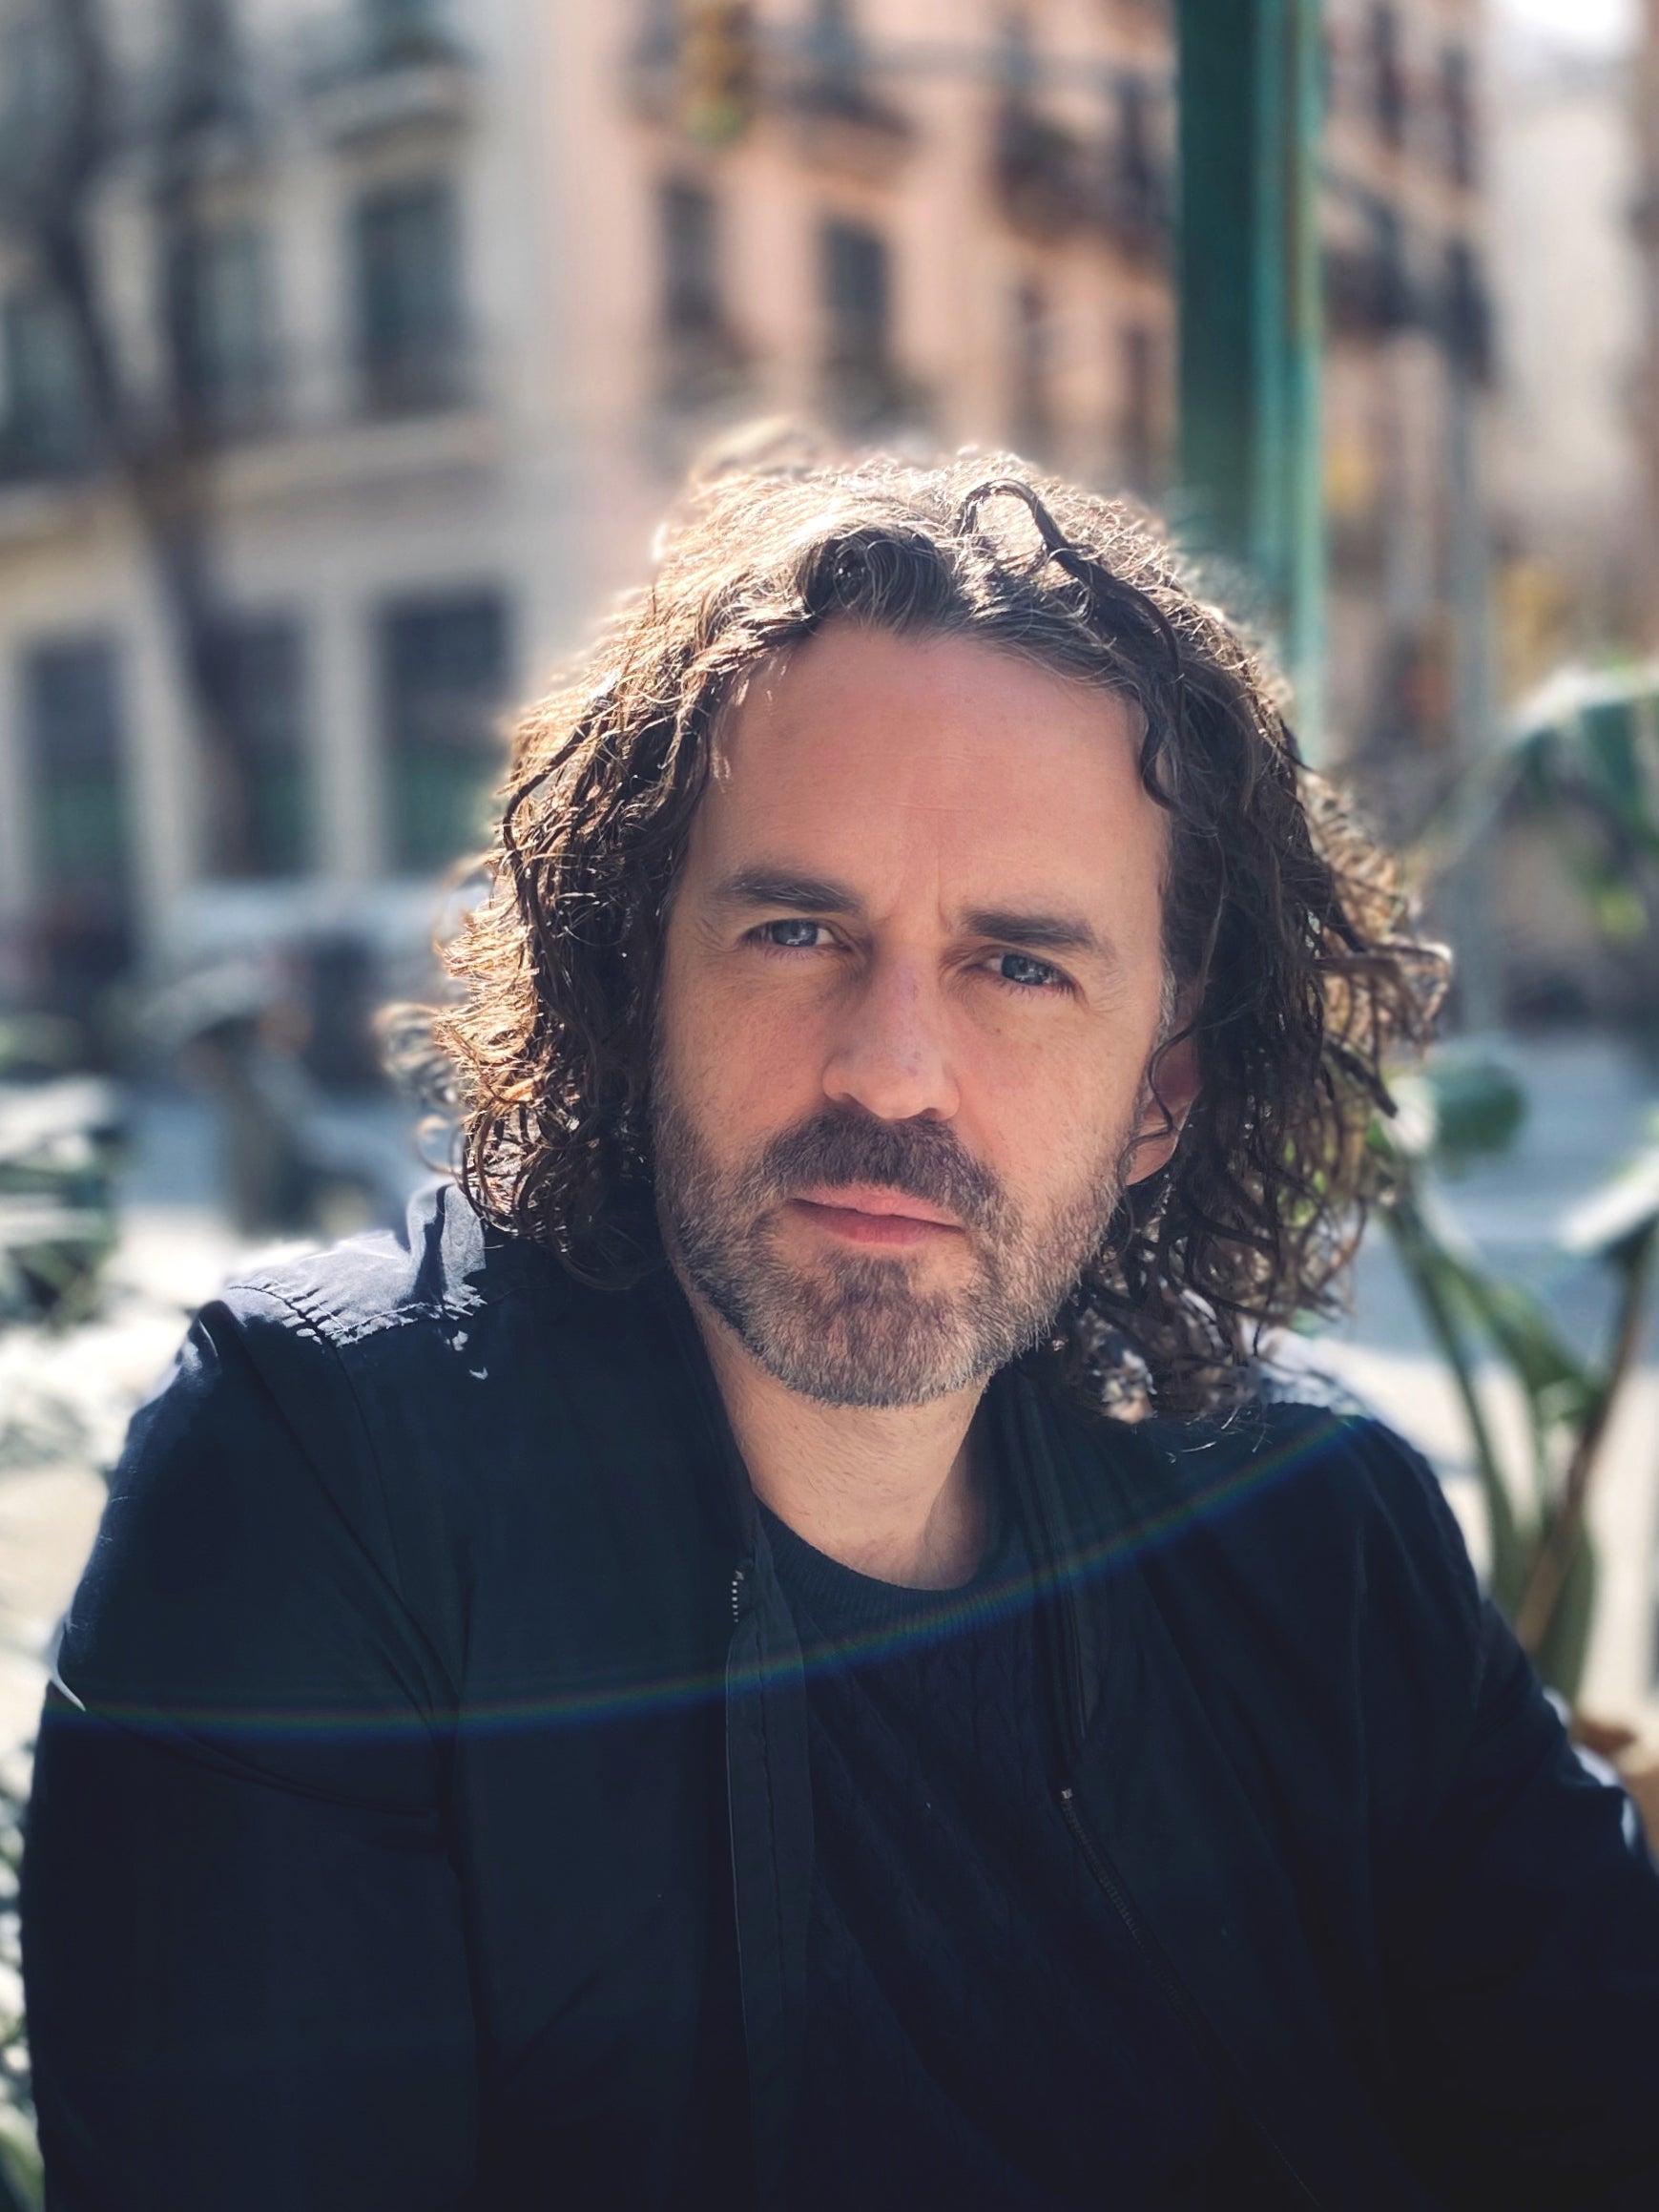 Animator Leo Sánchez